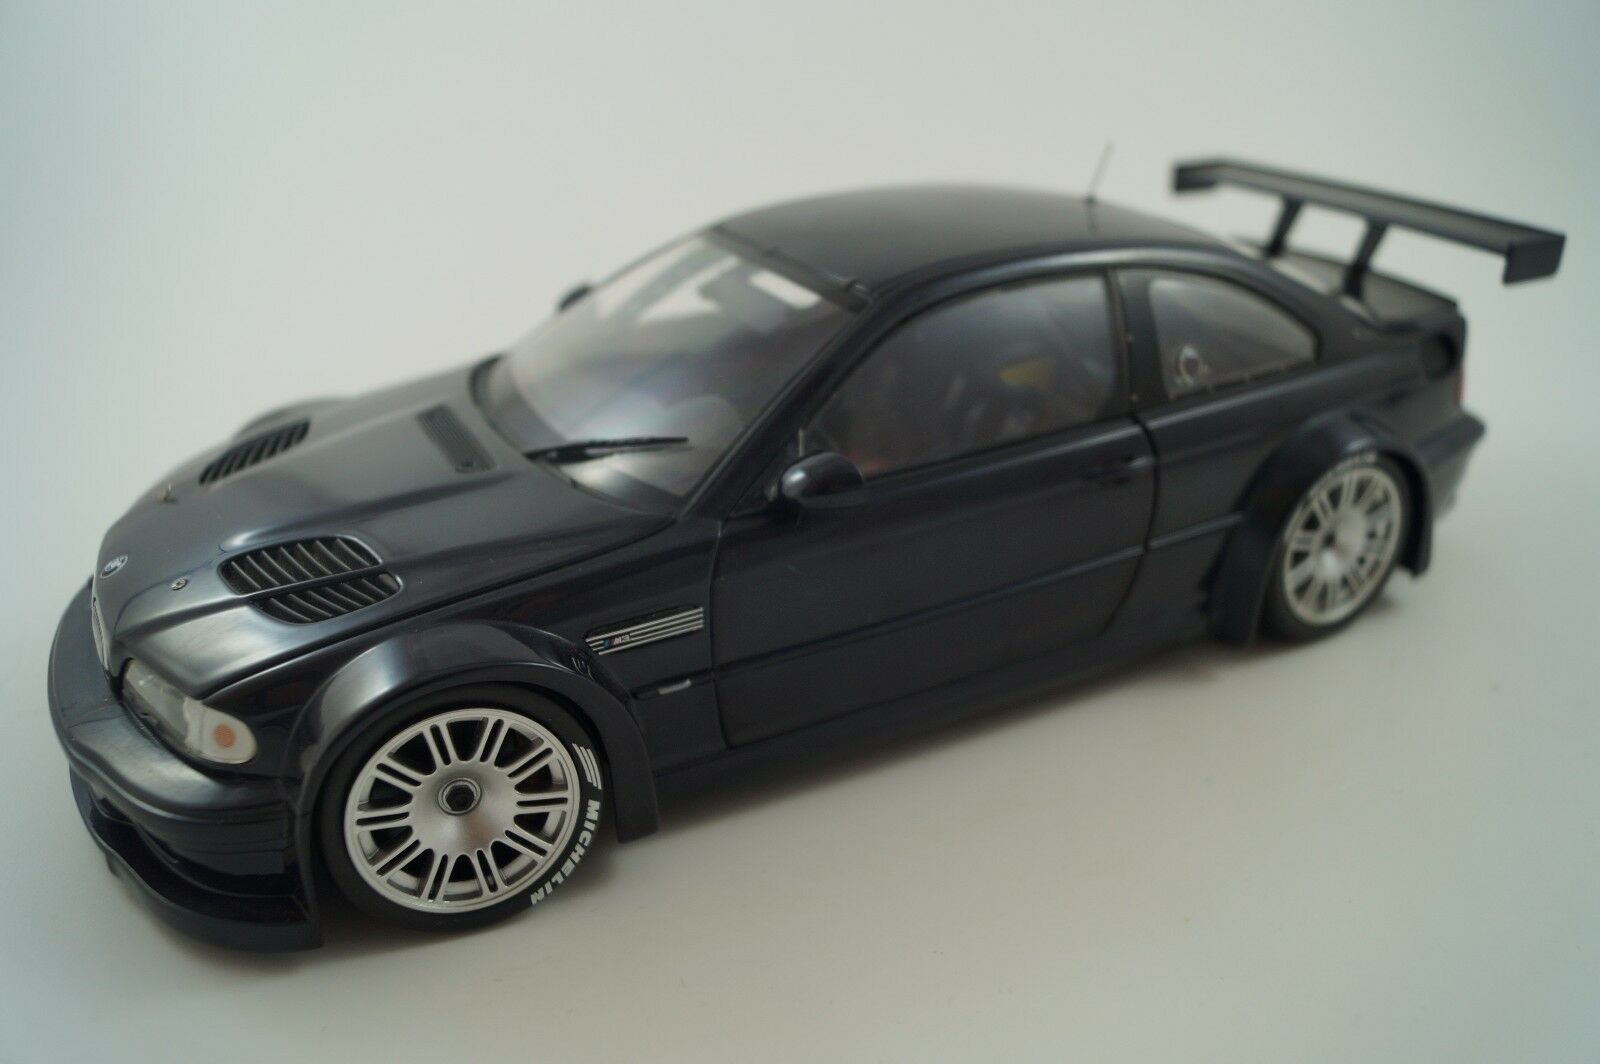 Minichamps maqueta de coche 1 18 bmw m3 GTR 2001